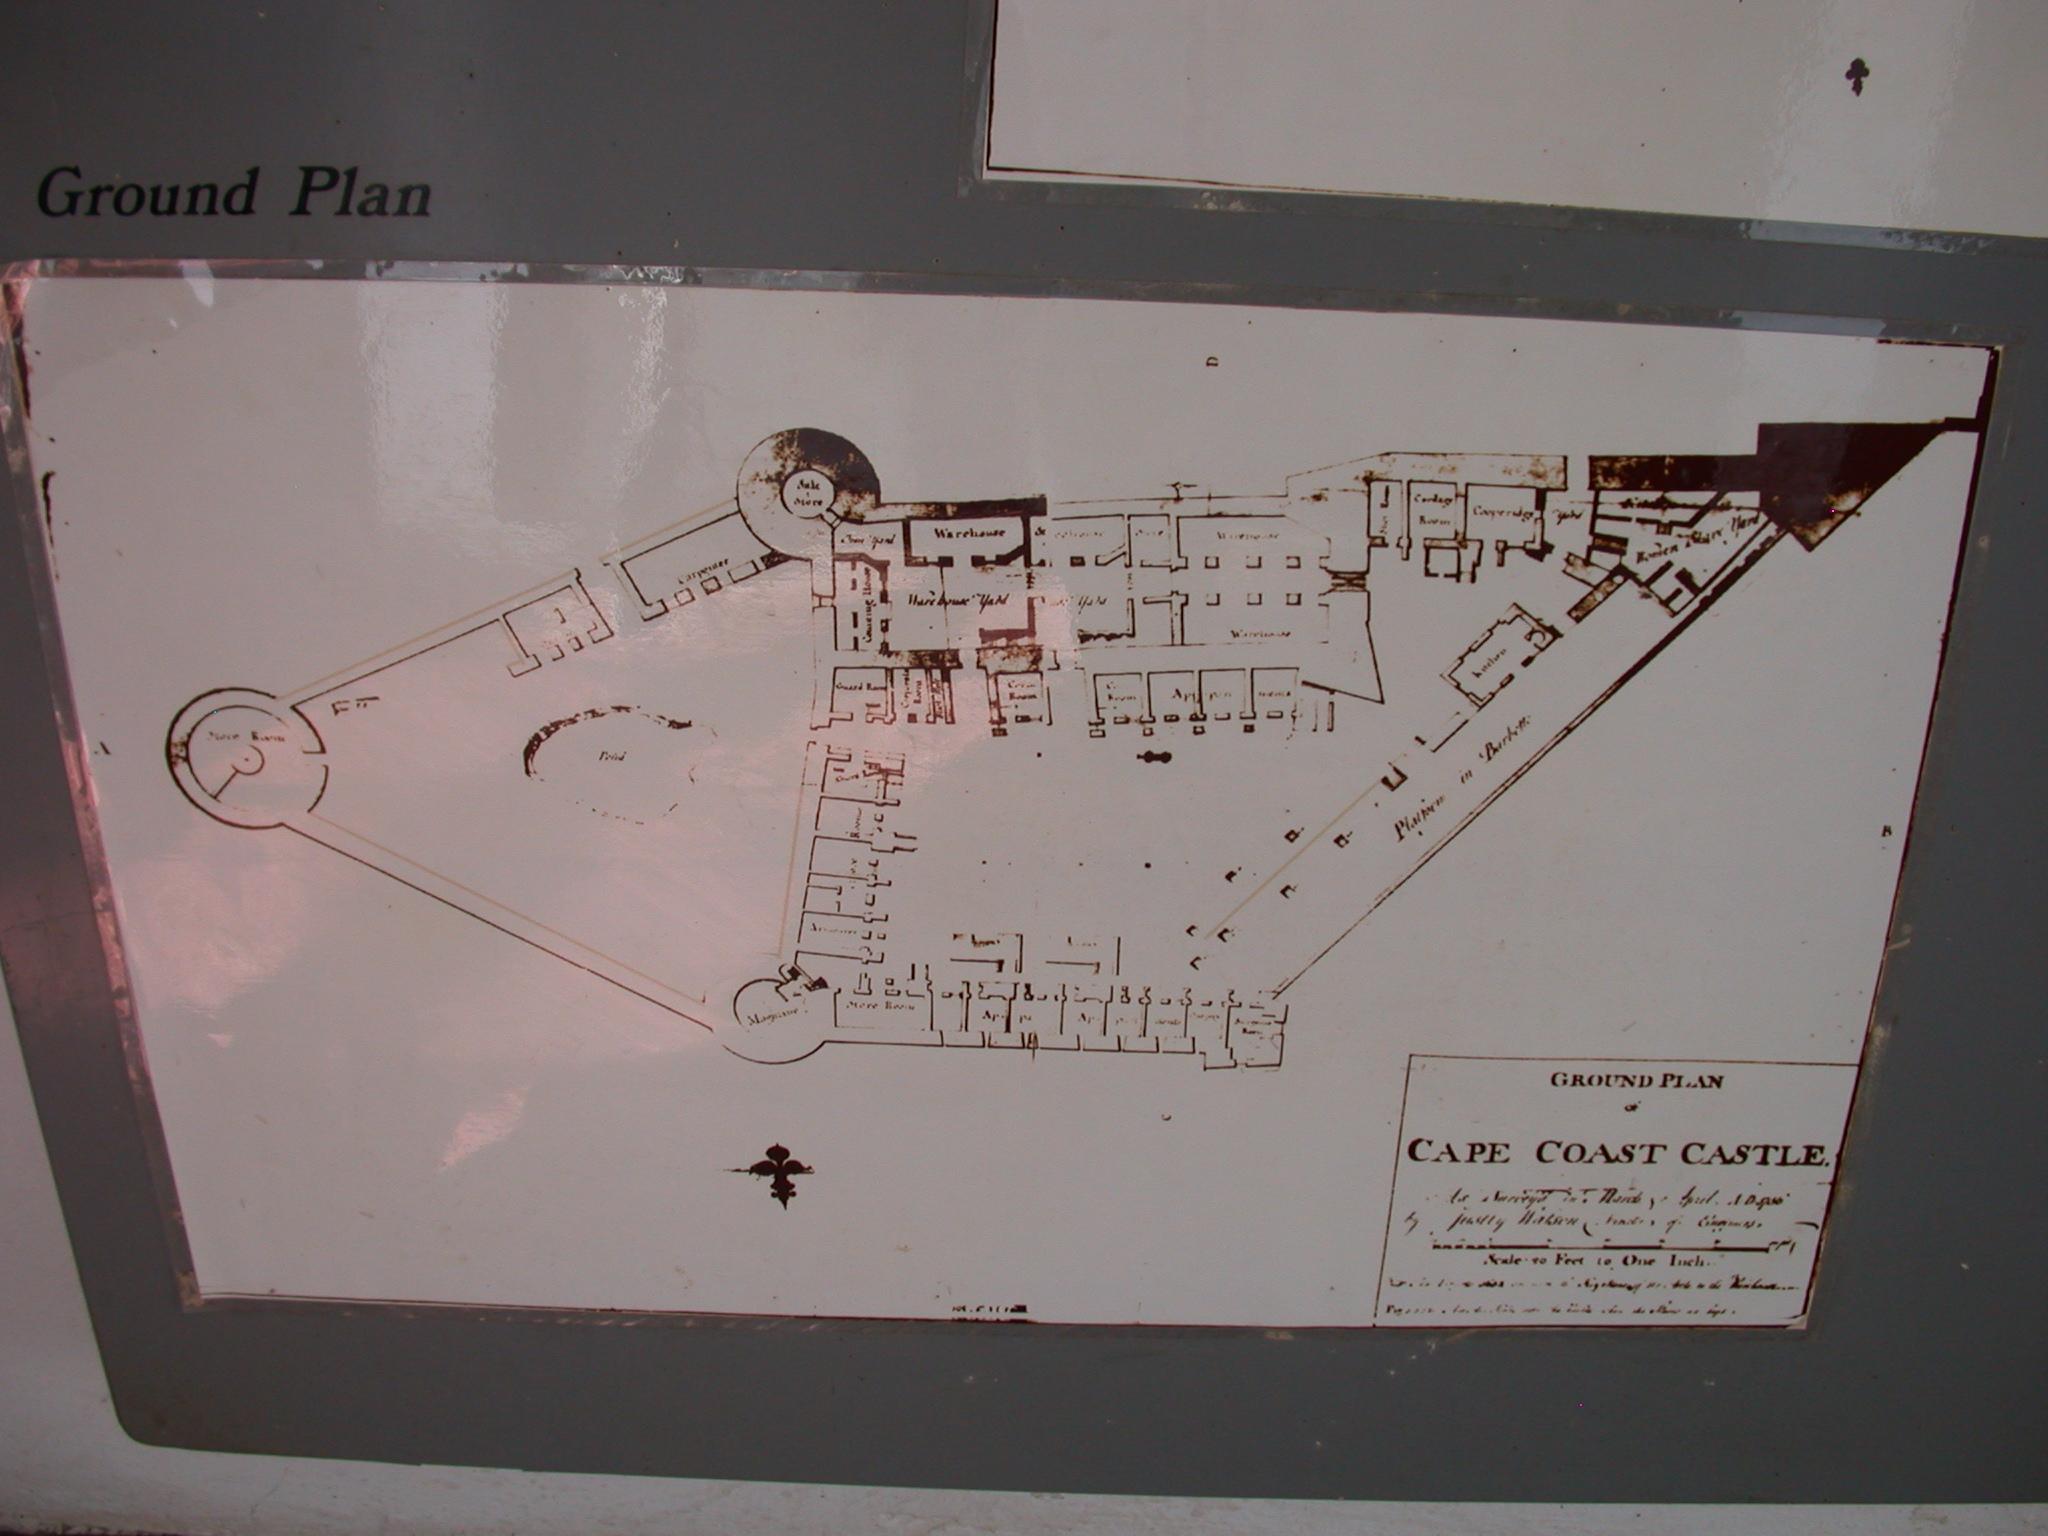 Cape Coast Ground Plan, Cape Coast Slave Fort Museum, Cape Coast, Ghana